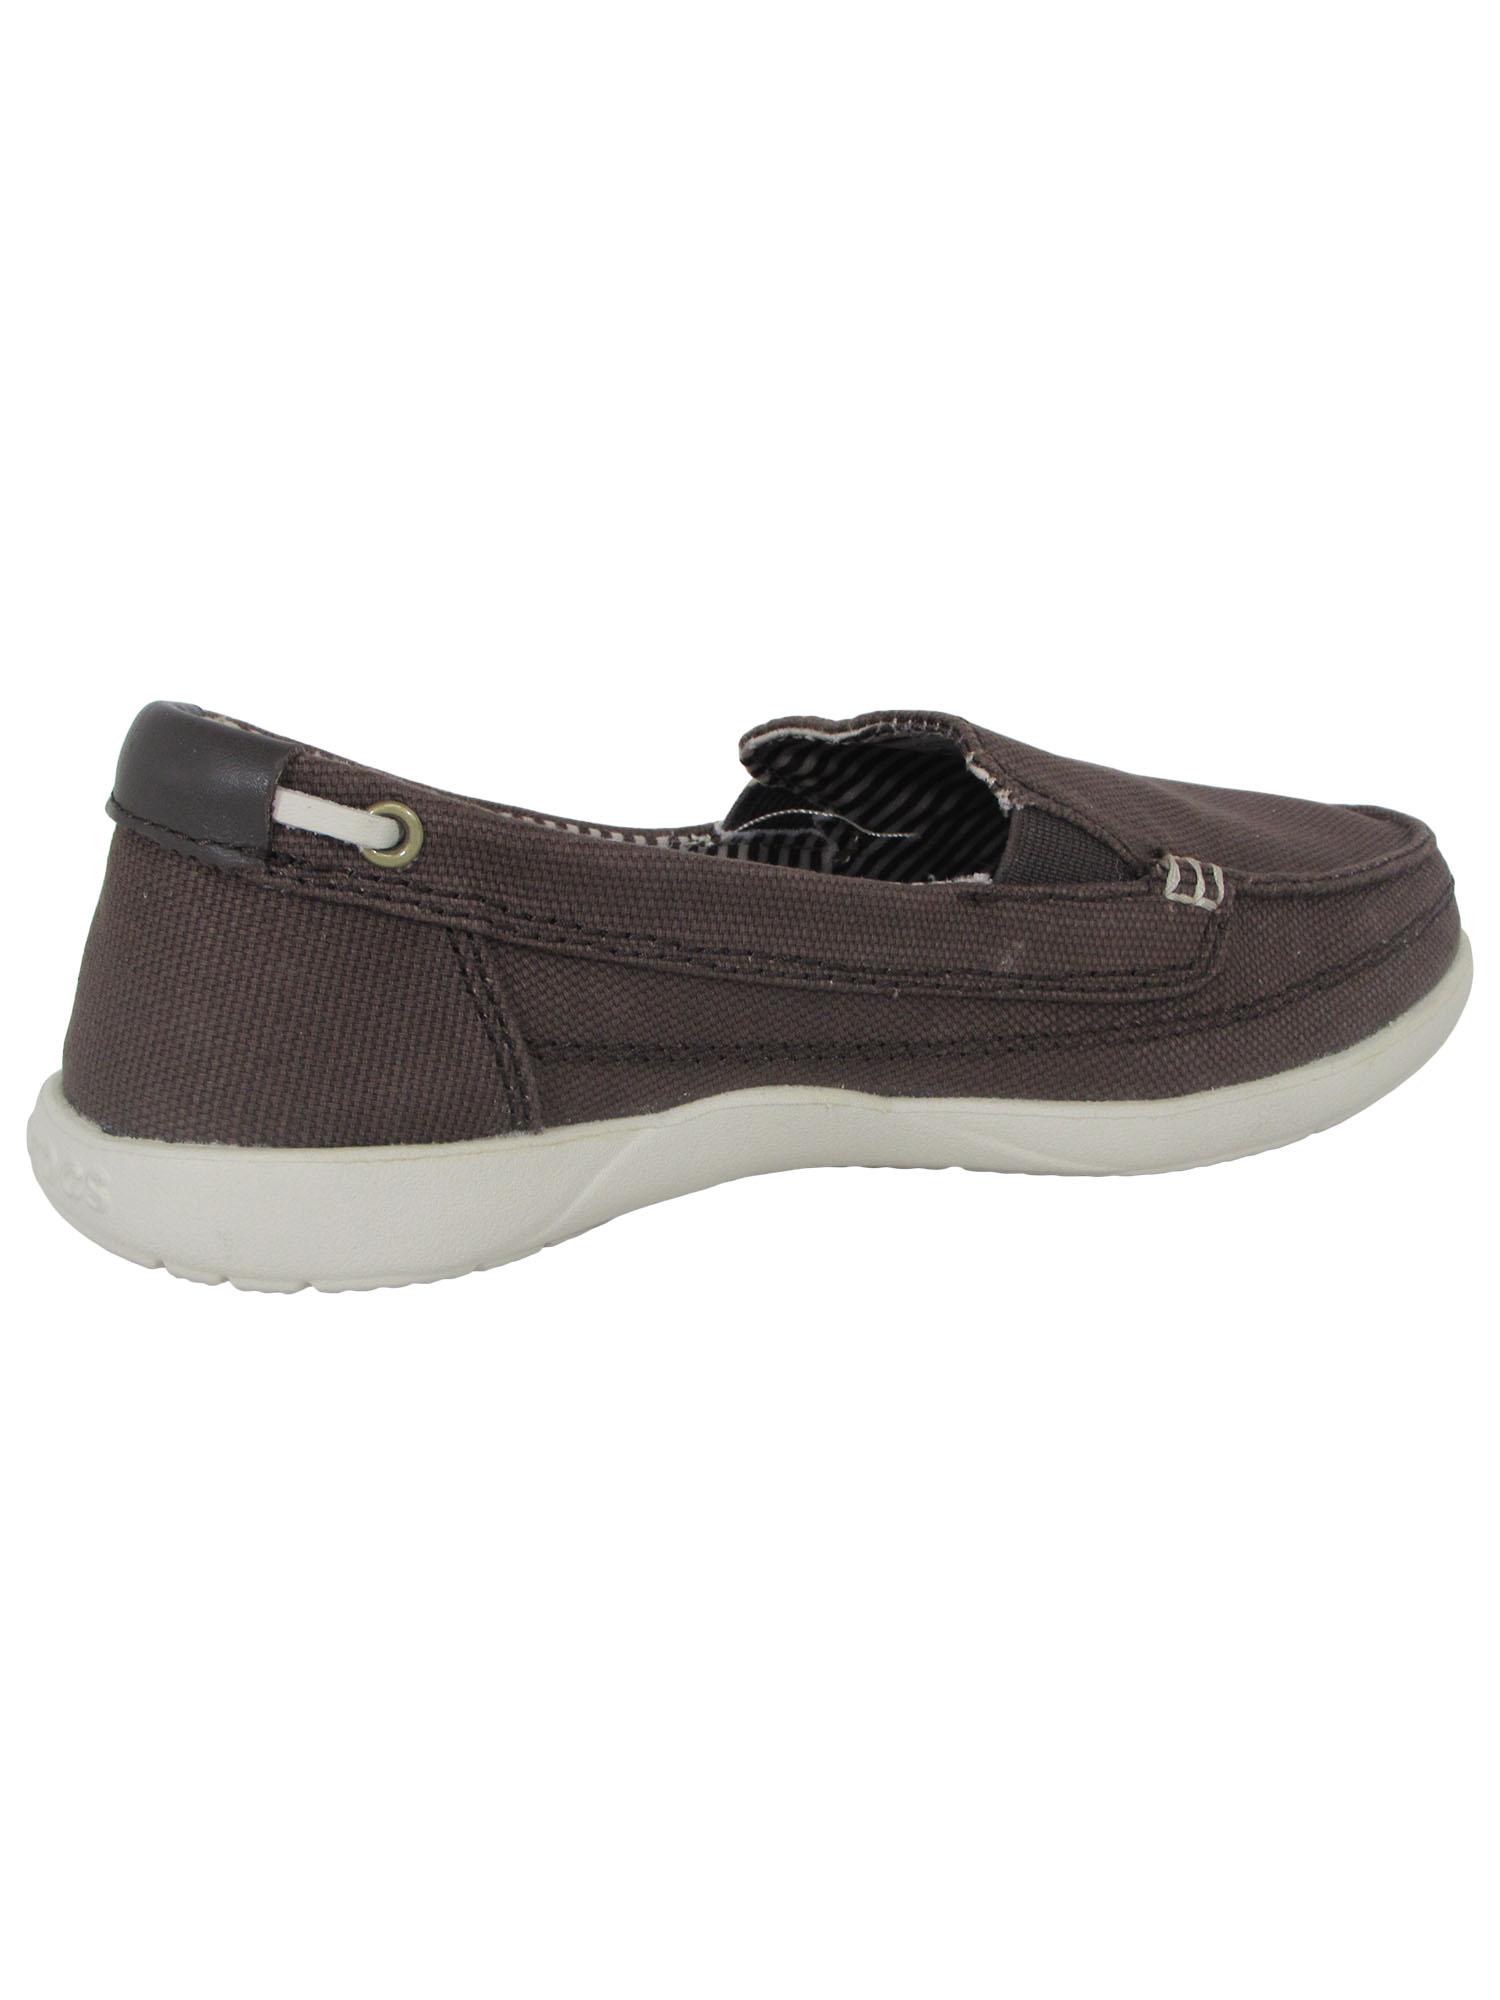 Crocs-Womens-Walu-Canvas-Loafer-Slip-On-Shoe thumbnail 7